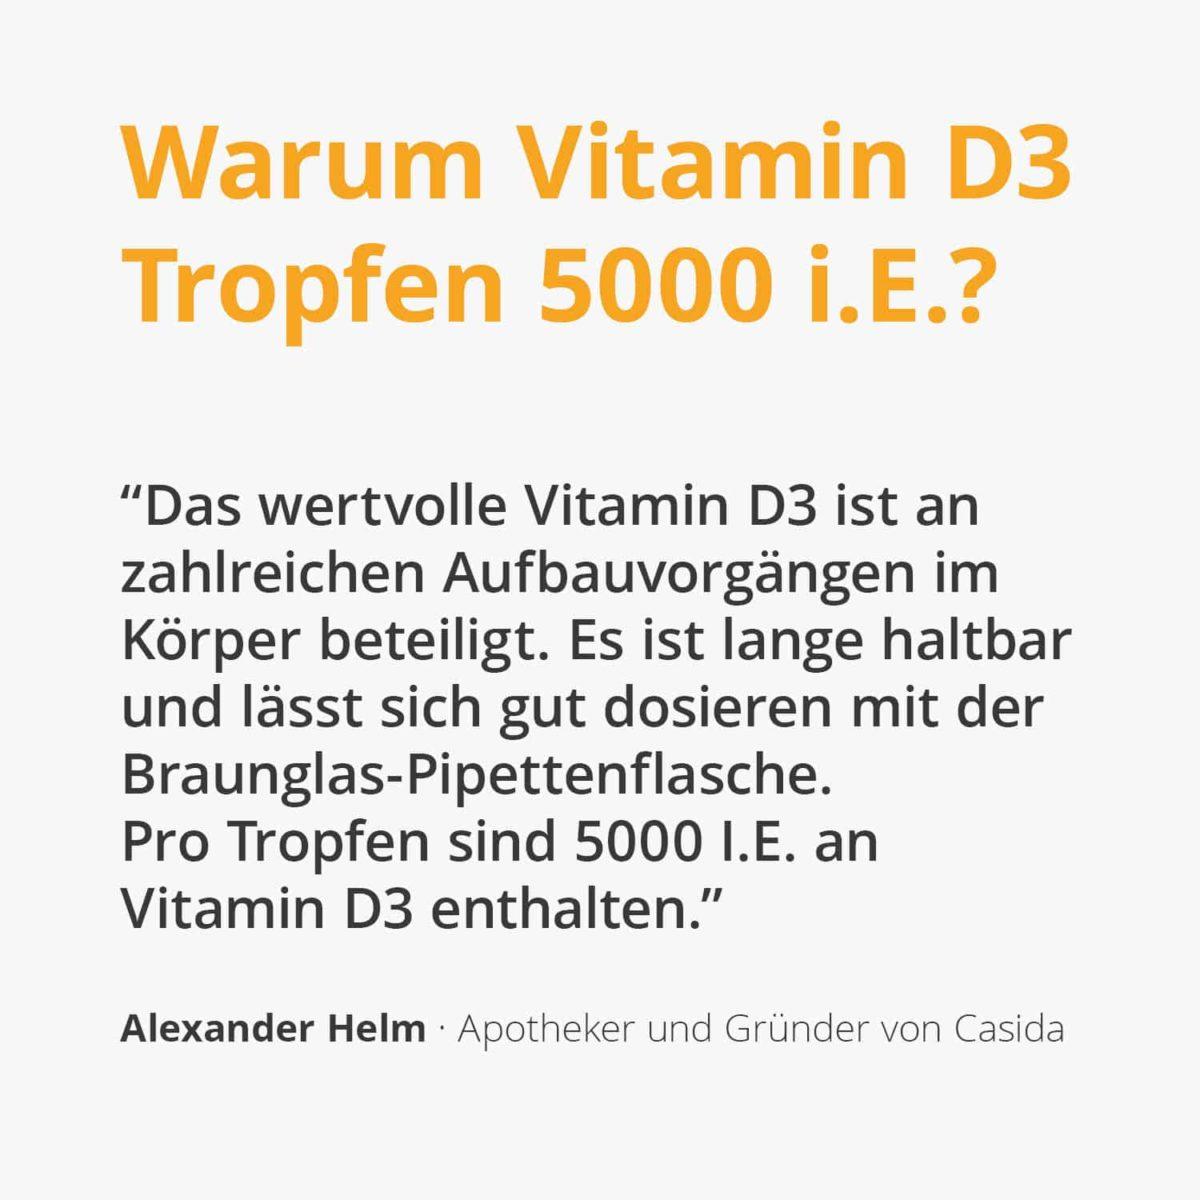 Casida Vitamin D3 Oil Drops Vital 5000 I.U. – 50 ml 16672032 PZN Apotheke hochdosiert Immunsystem Magnesium Calcium Aufnahme2